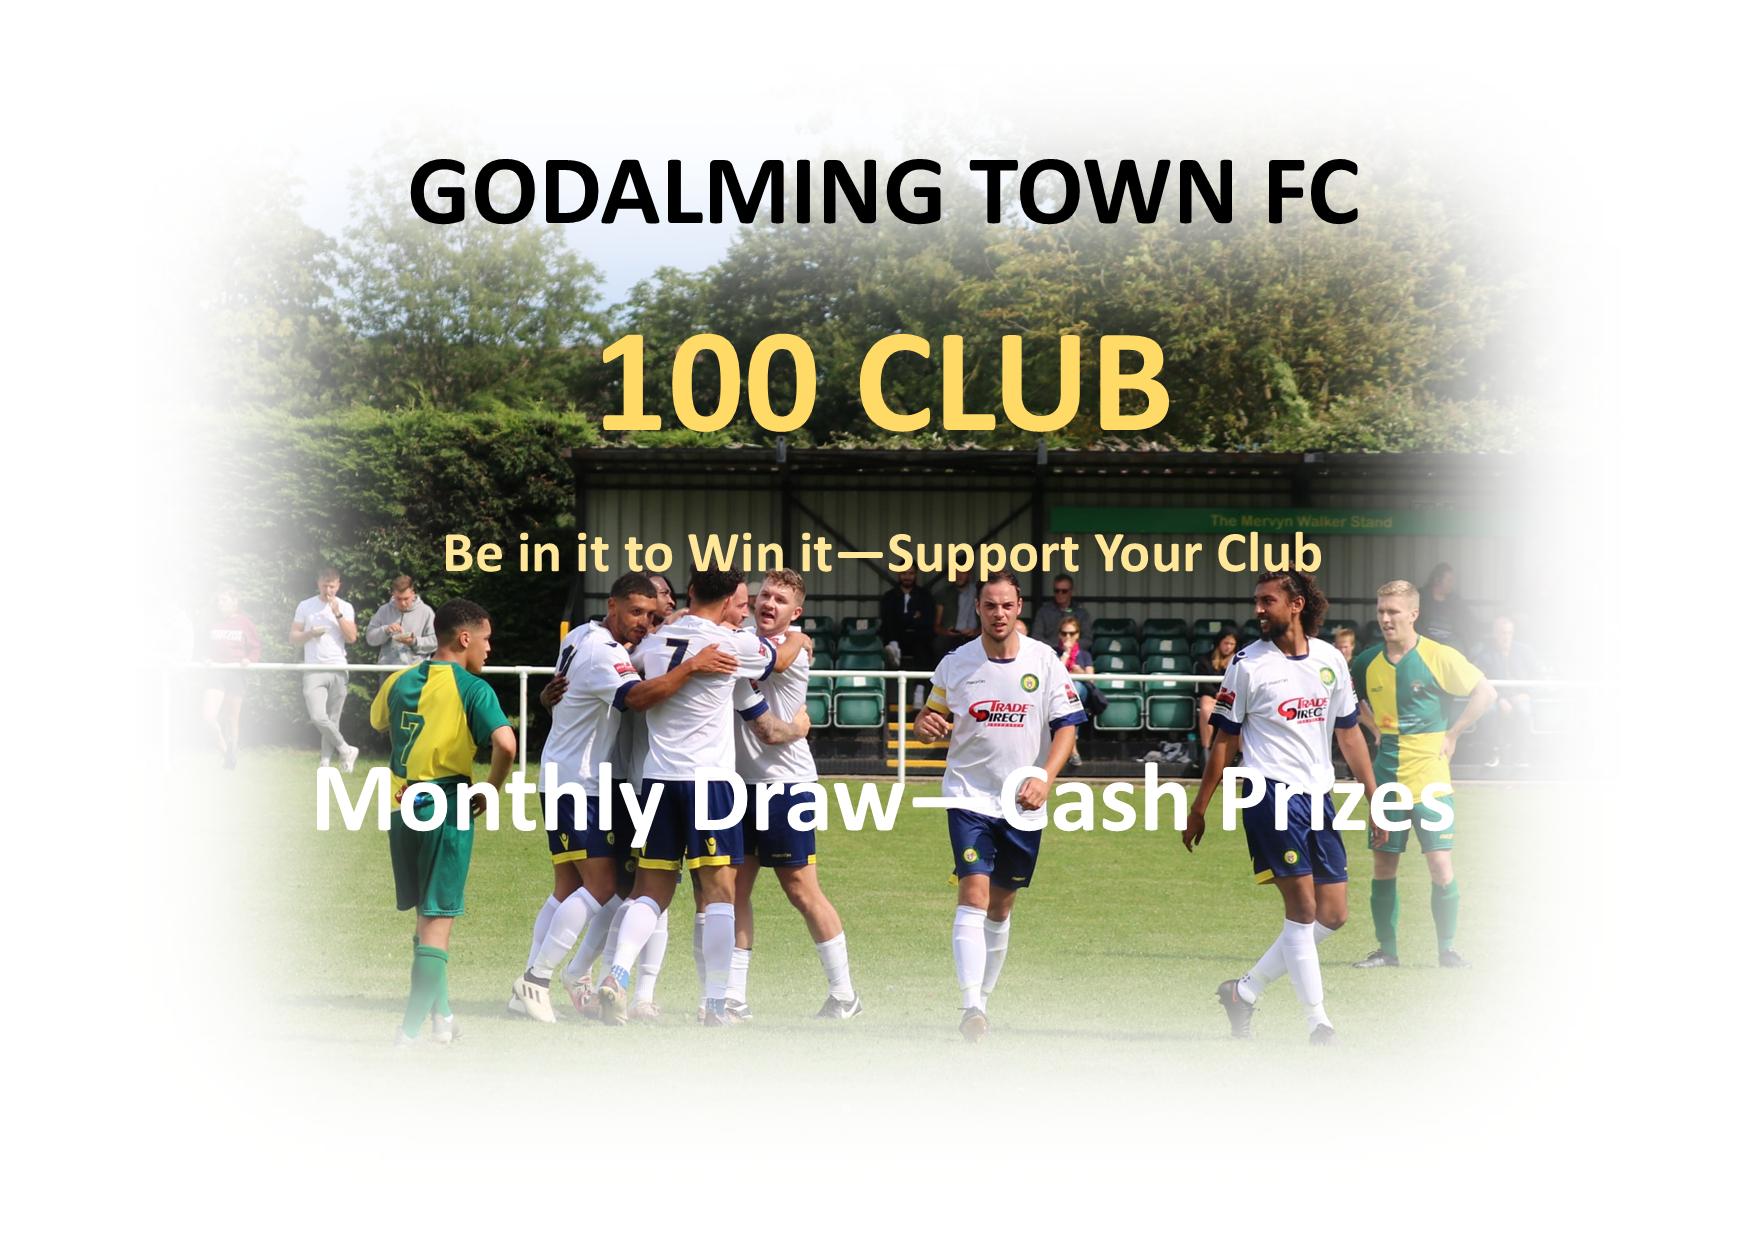 https://godalmingtownfc.co.uk/wp-content/uploads/2021/09/100-Club.png